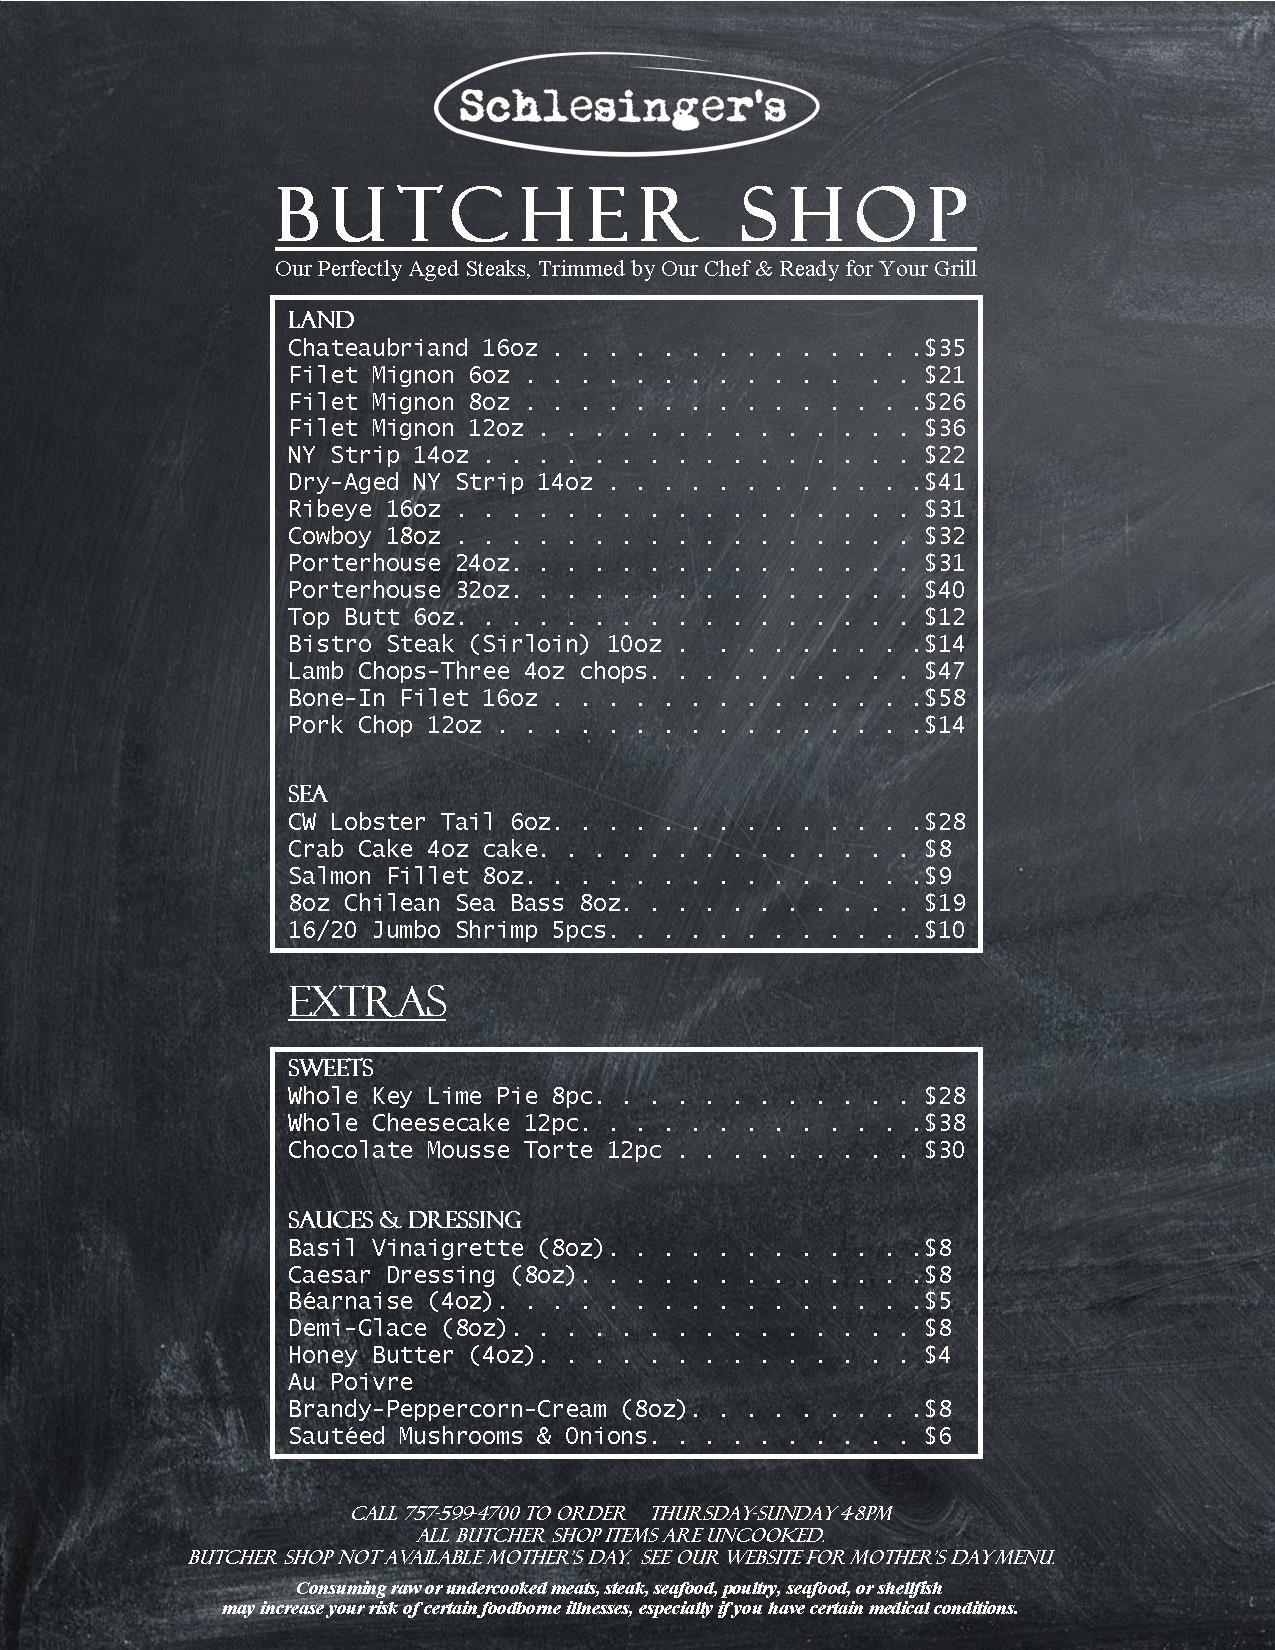 butchershop-8-x-10-chalk-schles